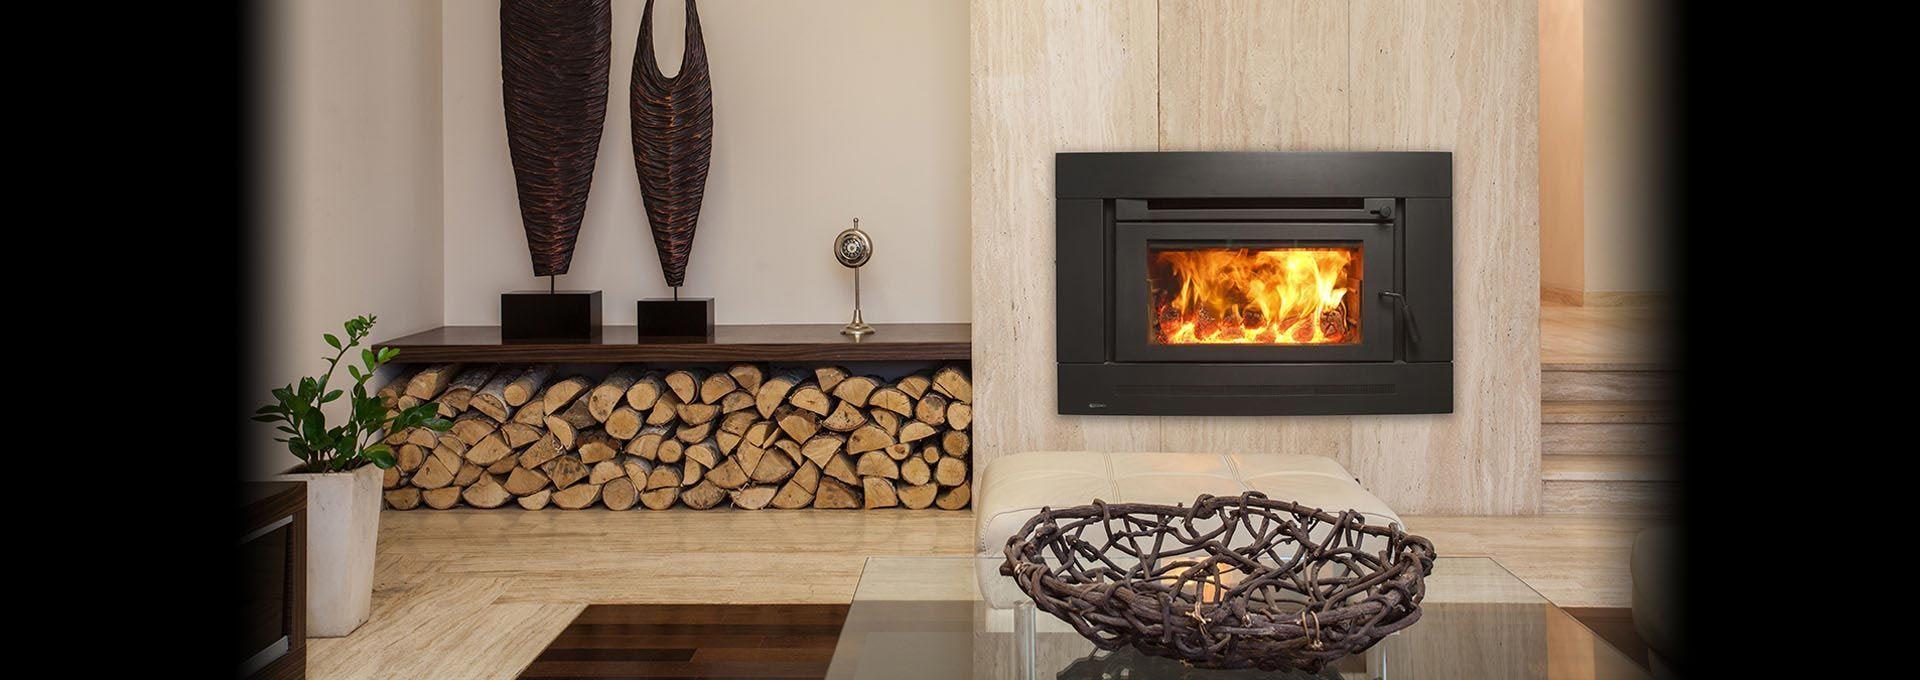 Wood Inbuilts Regency Fireplace Products Australia